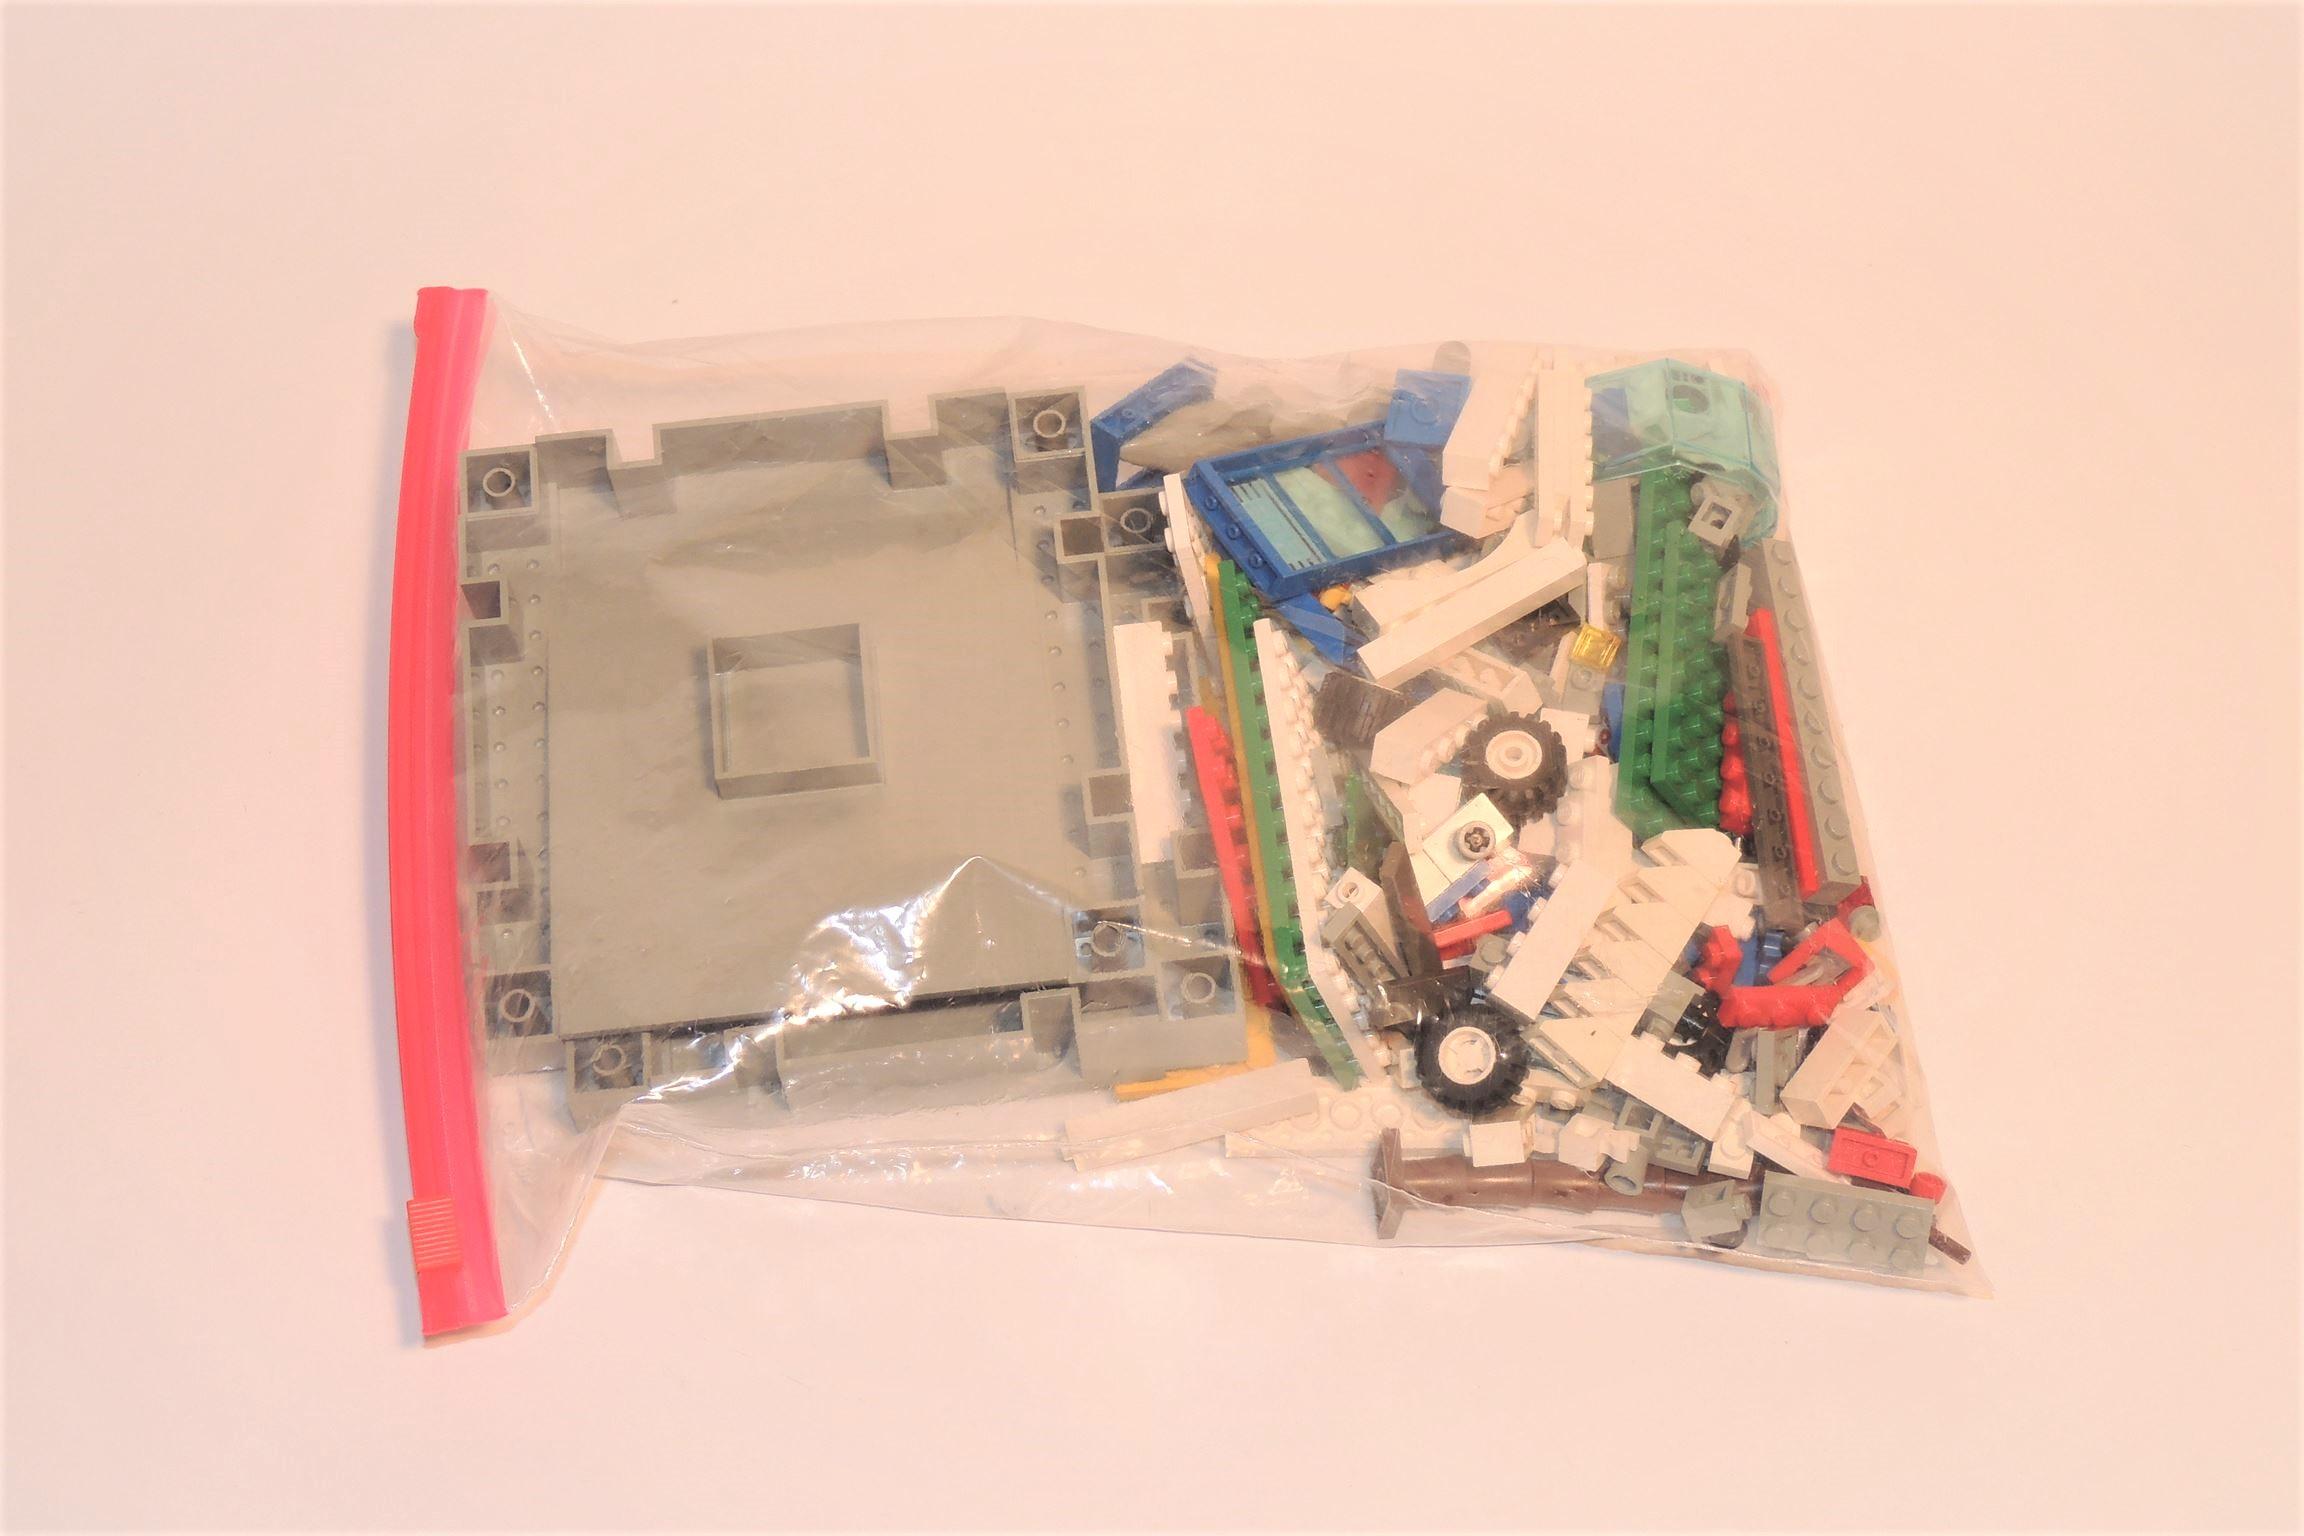 Originale Legoteile aus dem Konvolut.